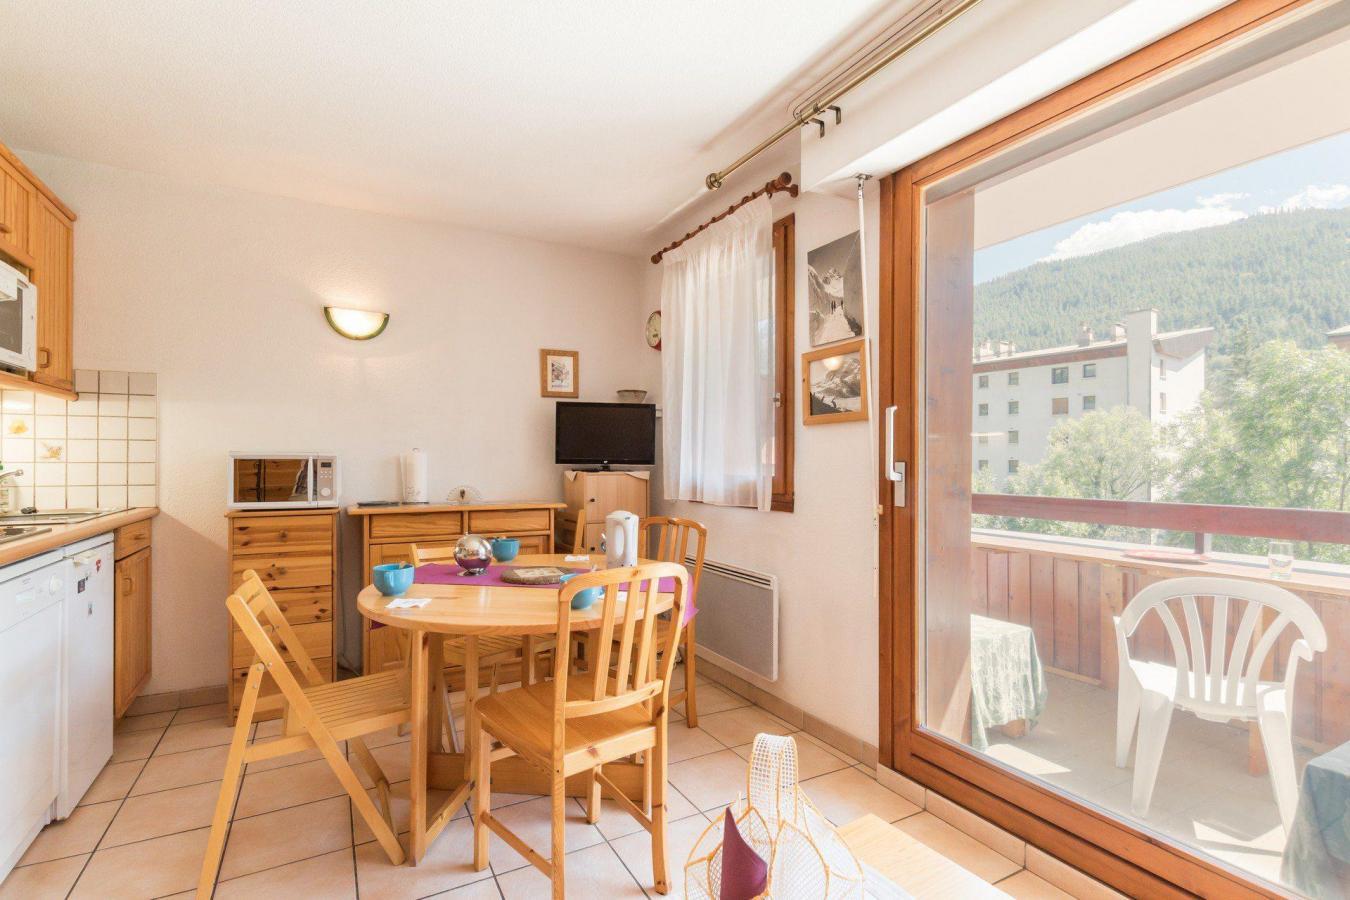 Location au ski Studio cabine 4 personnes (566) - Residence Vallonpierre - Serre Chevalier